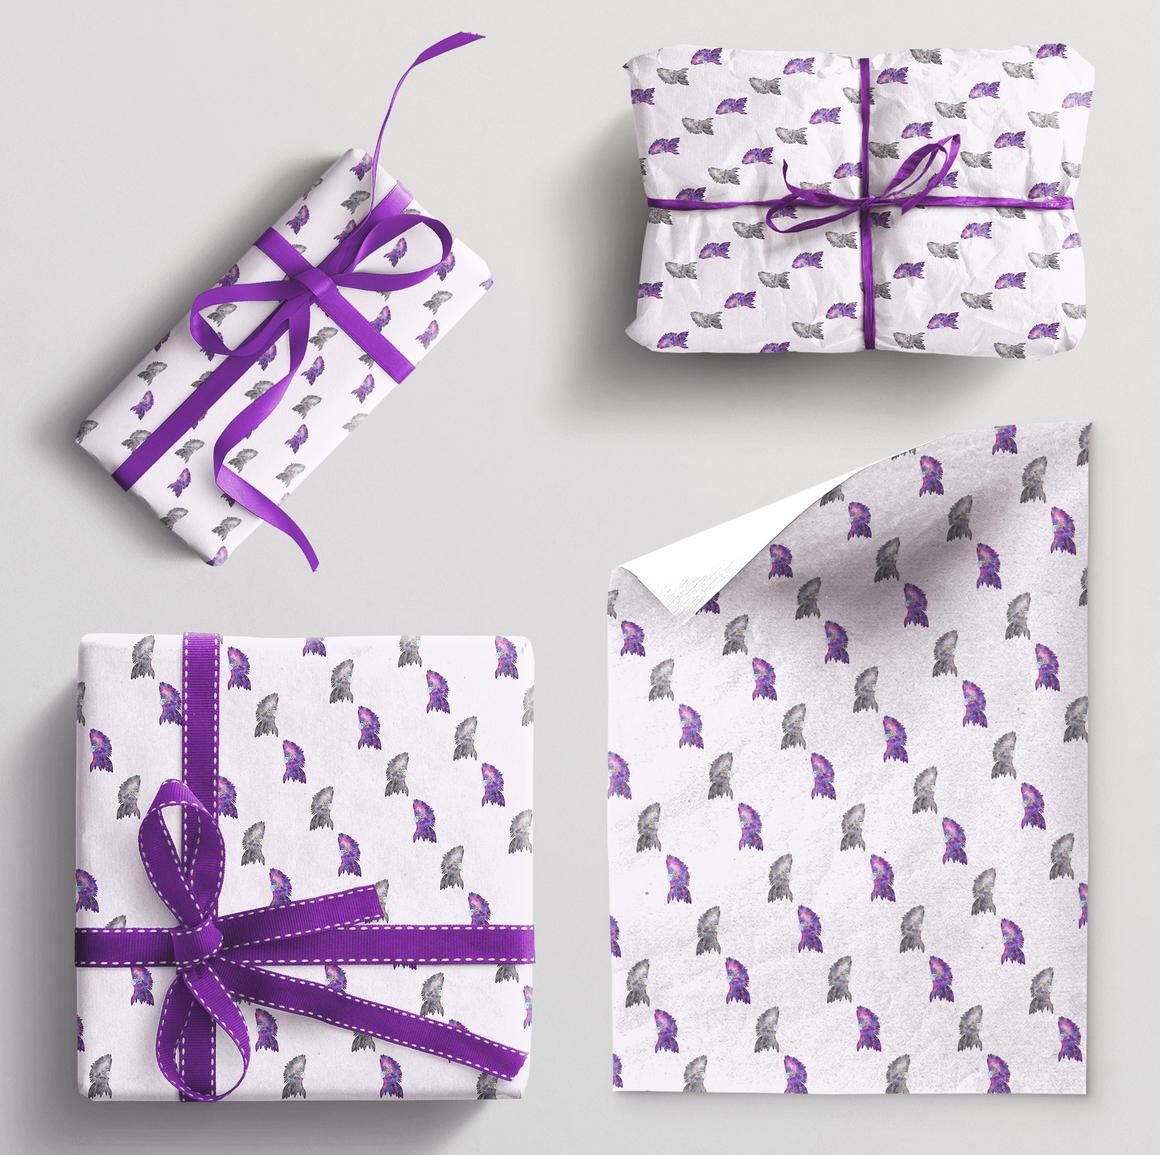 Wrapping paper single sheet Cockatoo | Trada Marketplace